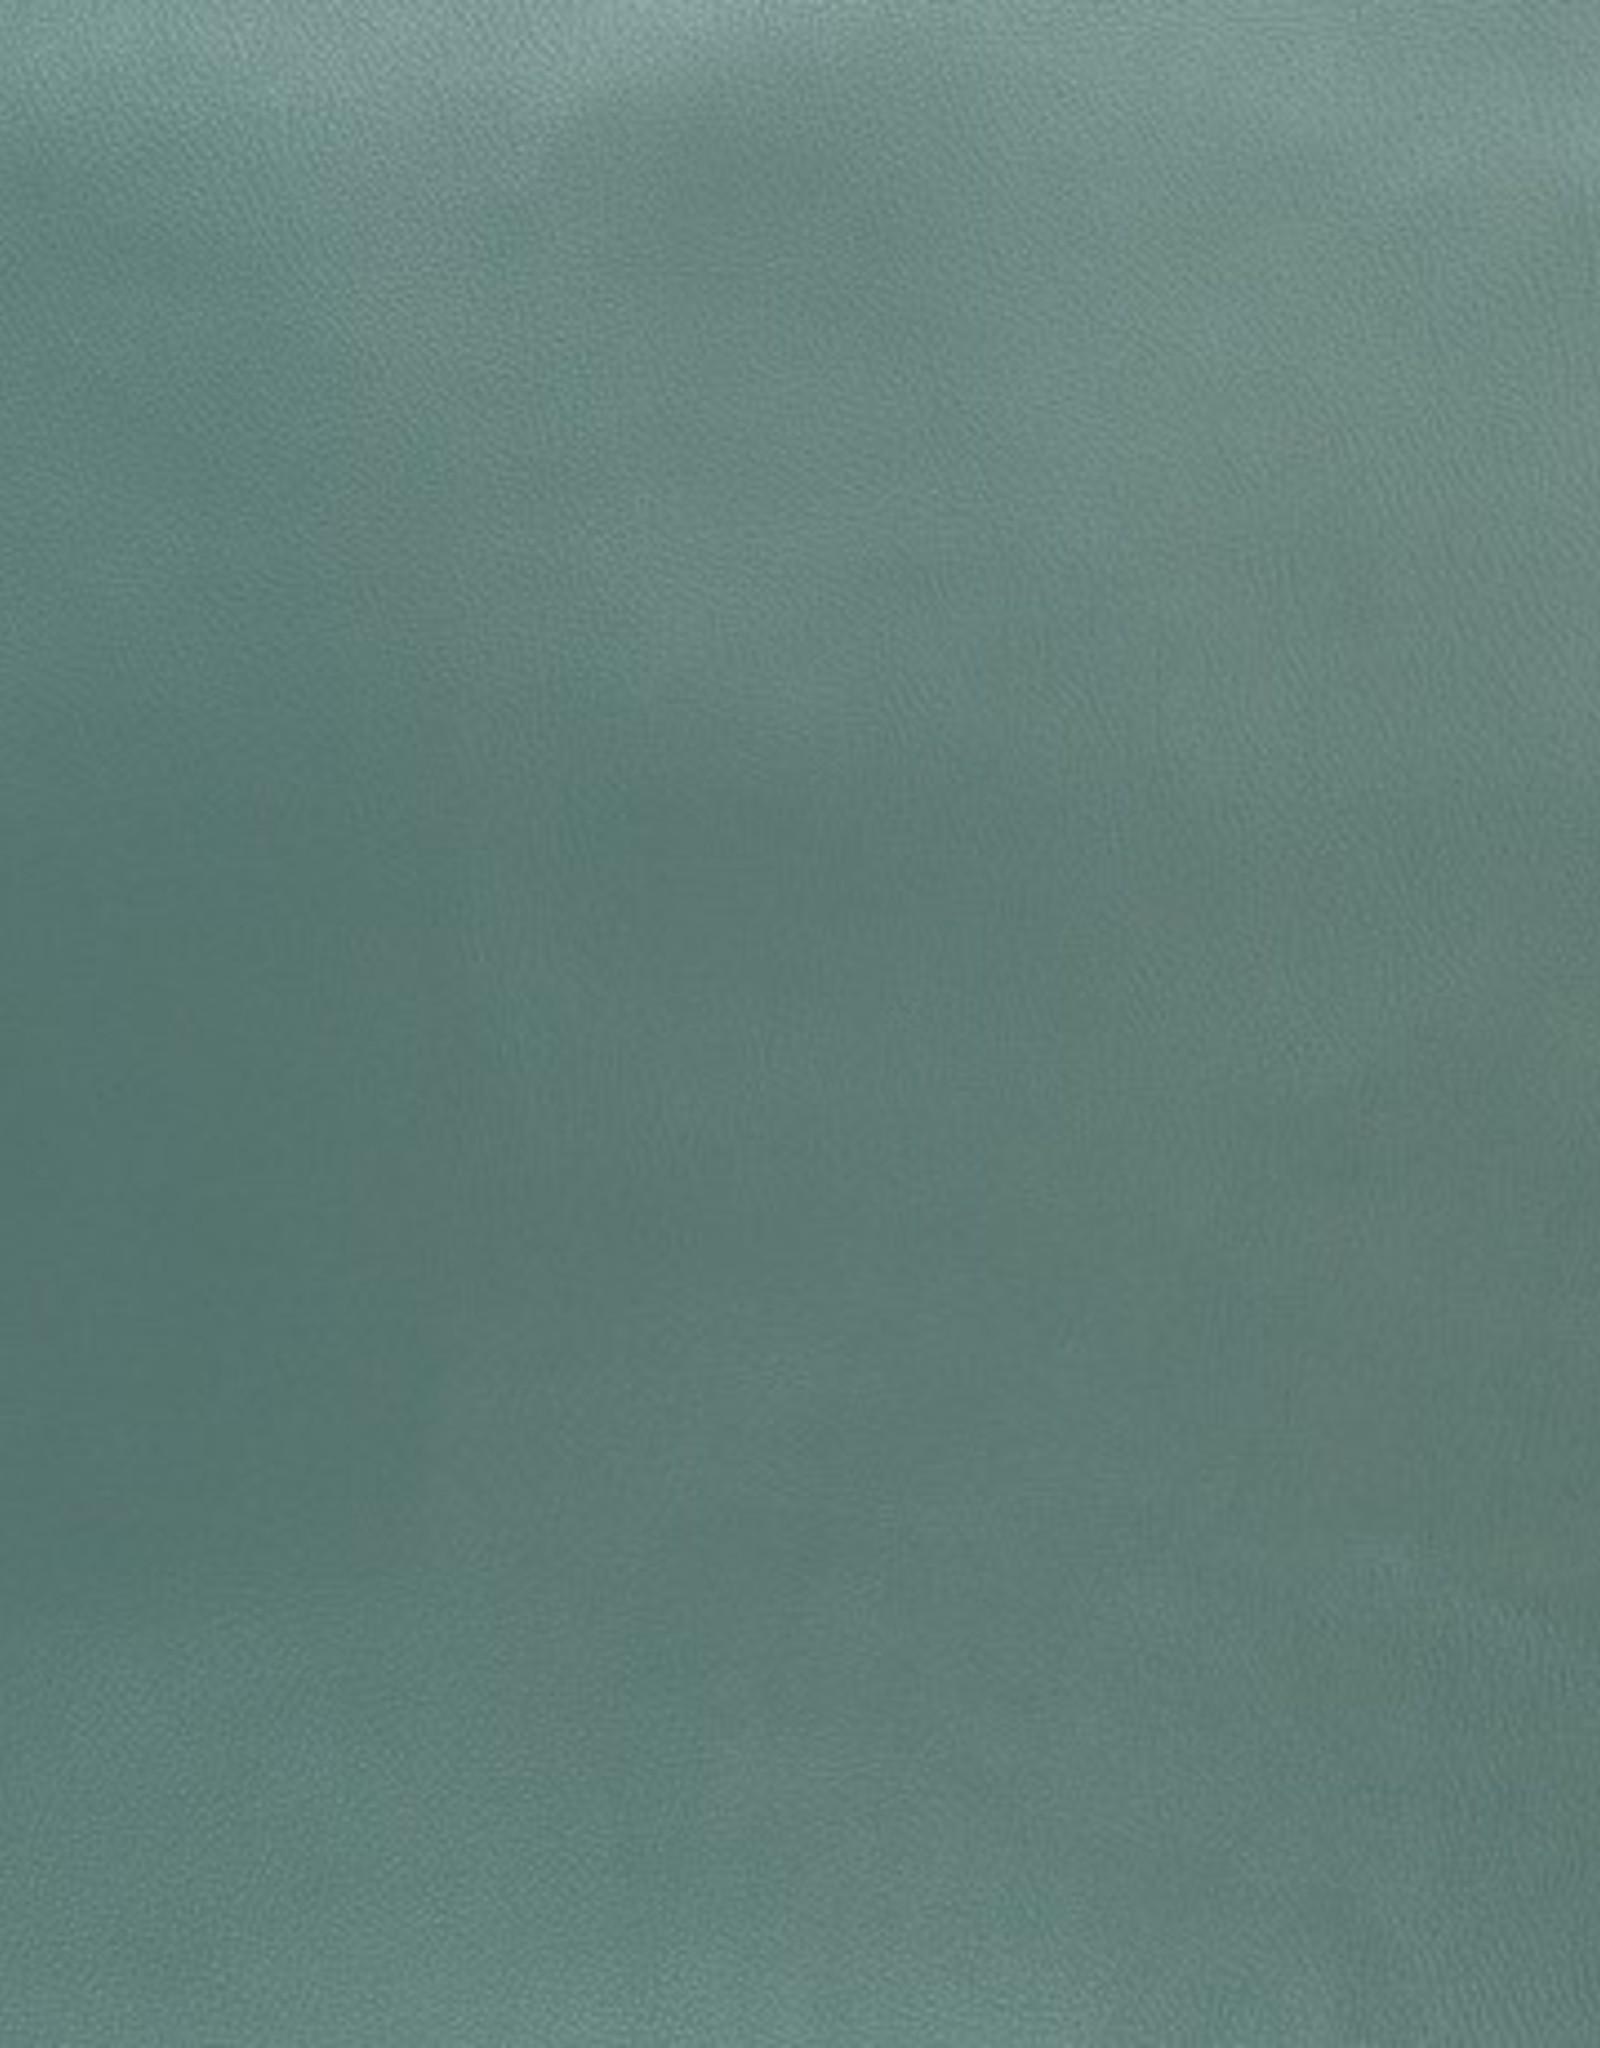 Faux leather appelblauwzeegroen